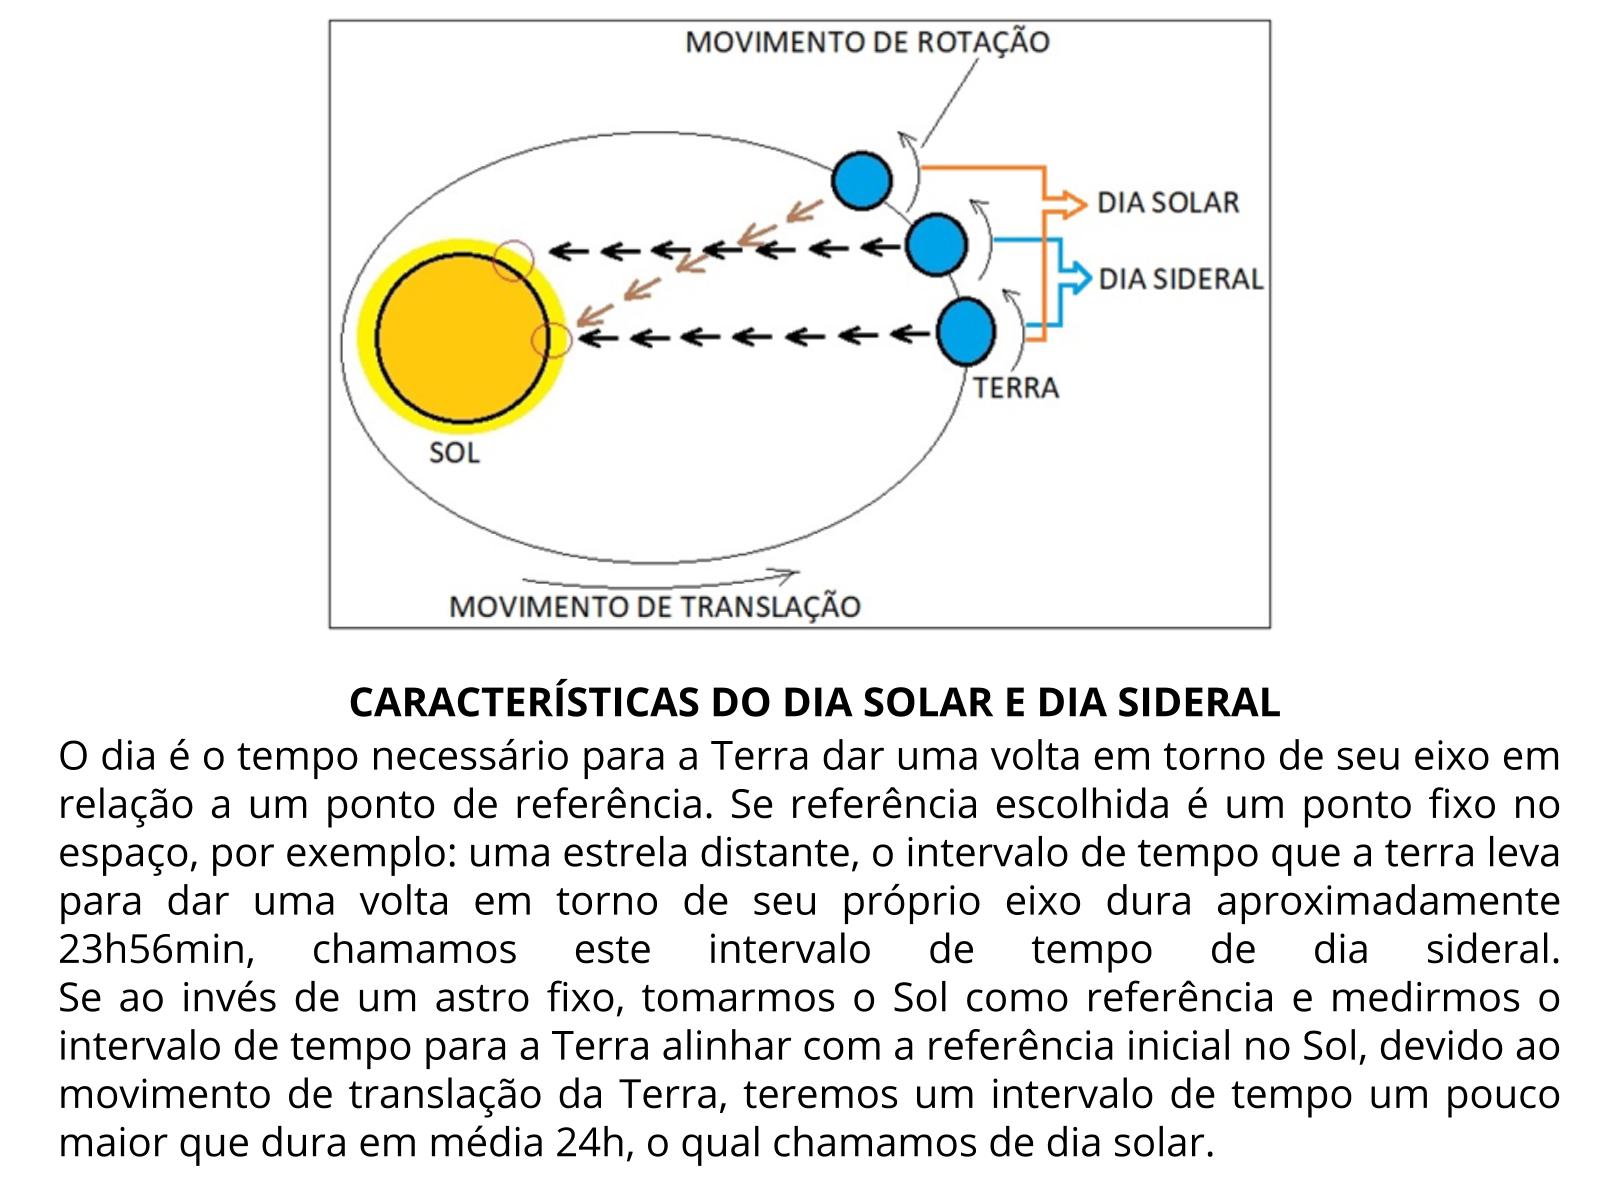 Dia solar e dia sideral